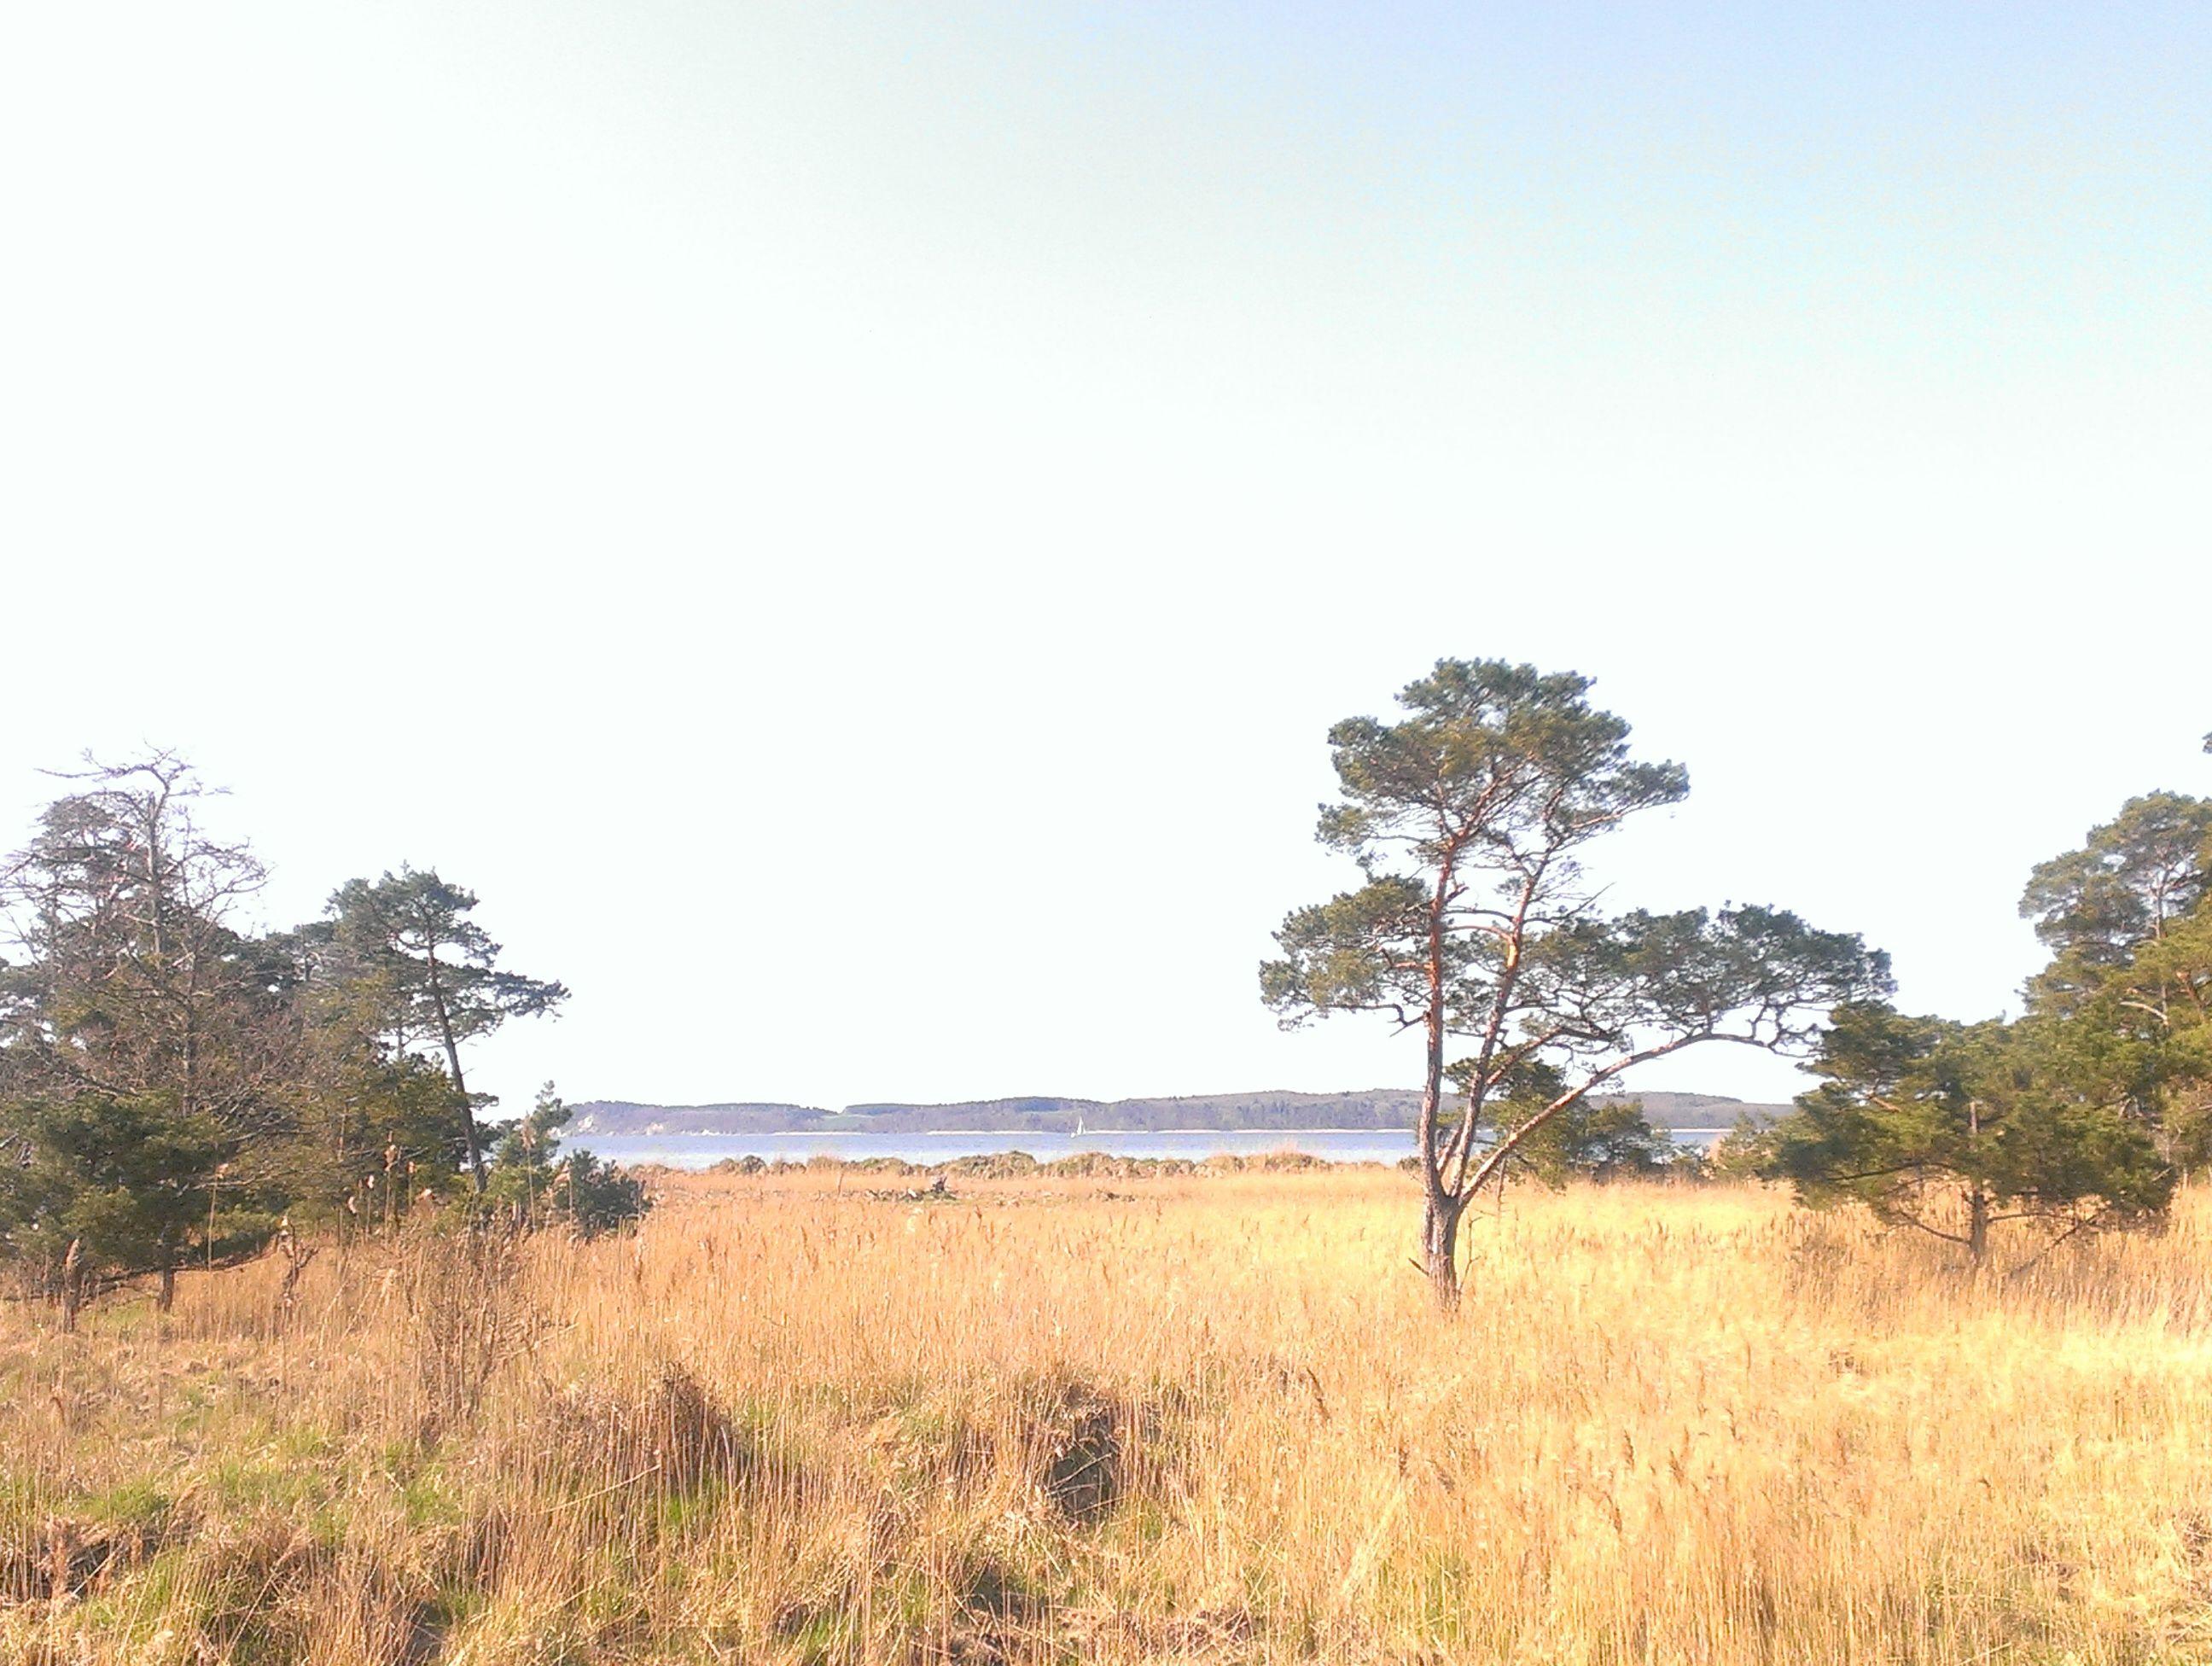 Boddenlandschaft bei Glowe Insel rügen, Hiddensee, Bilder